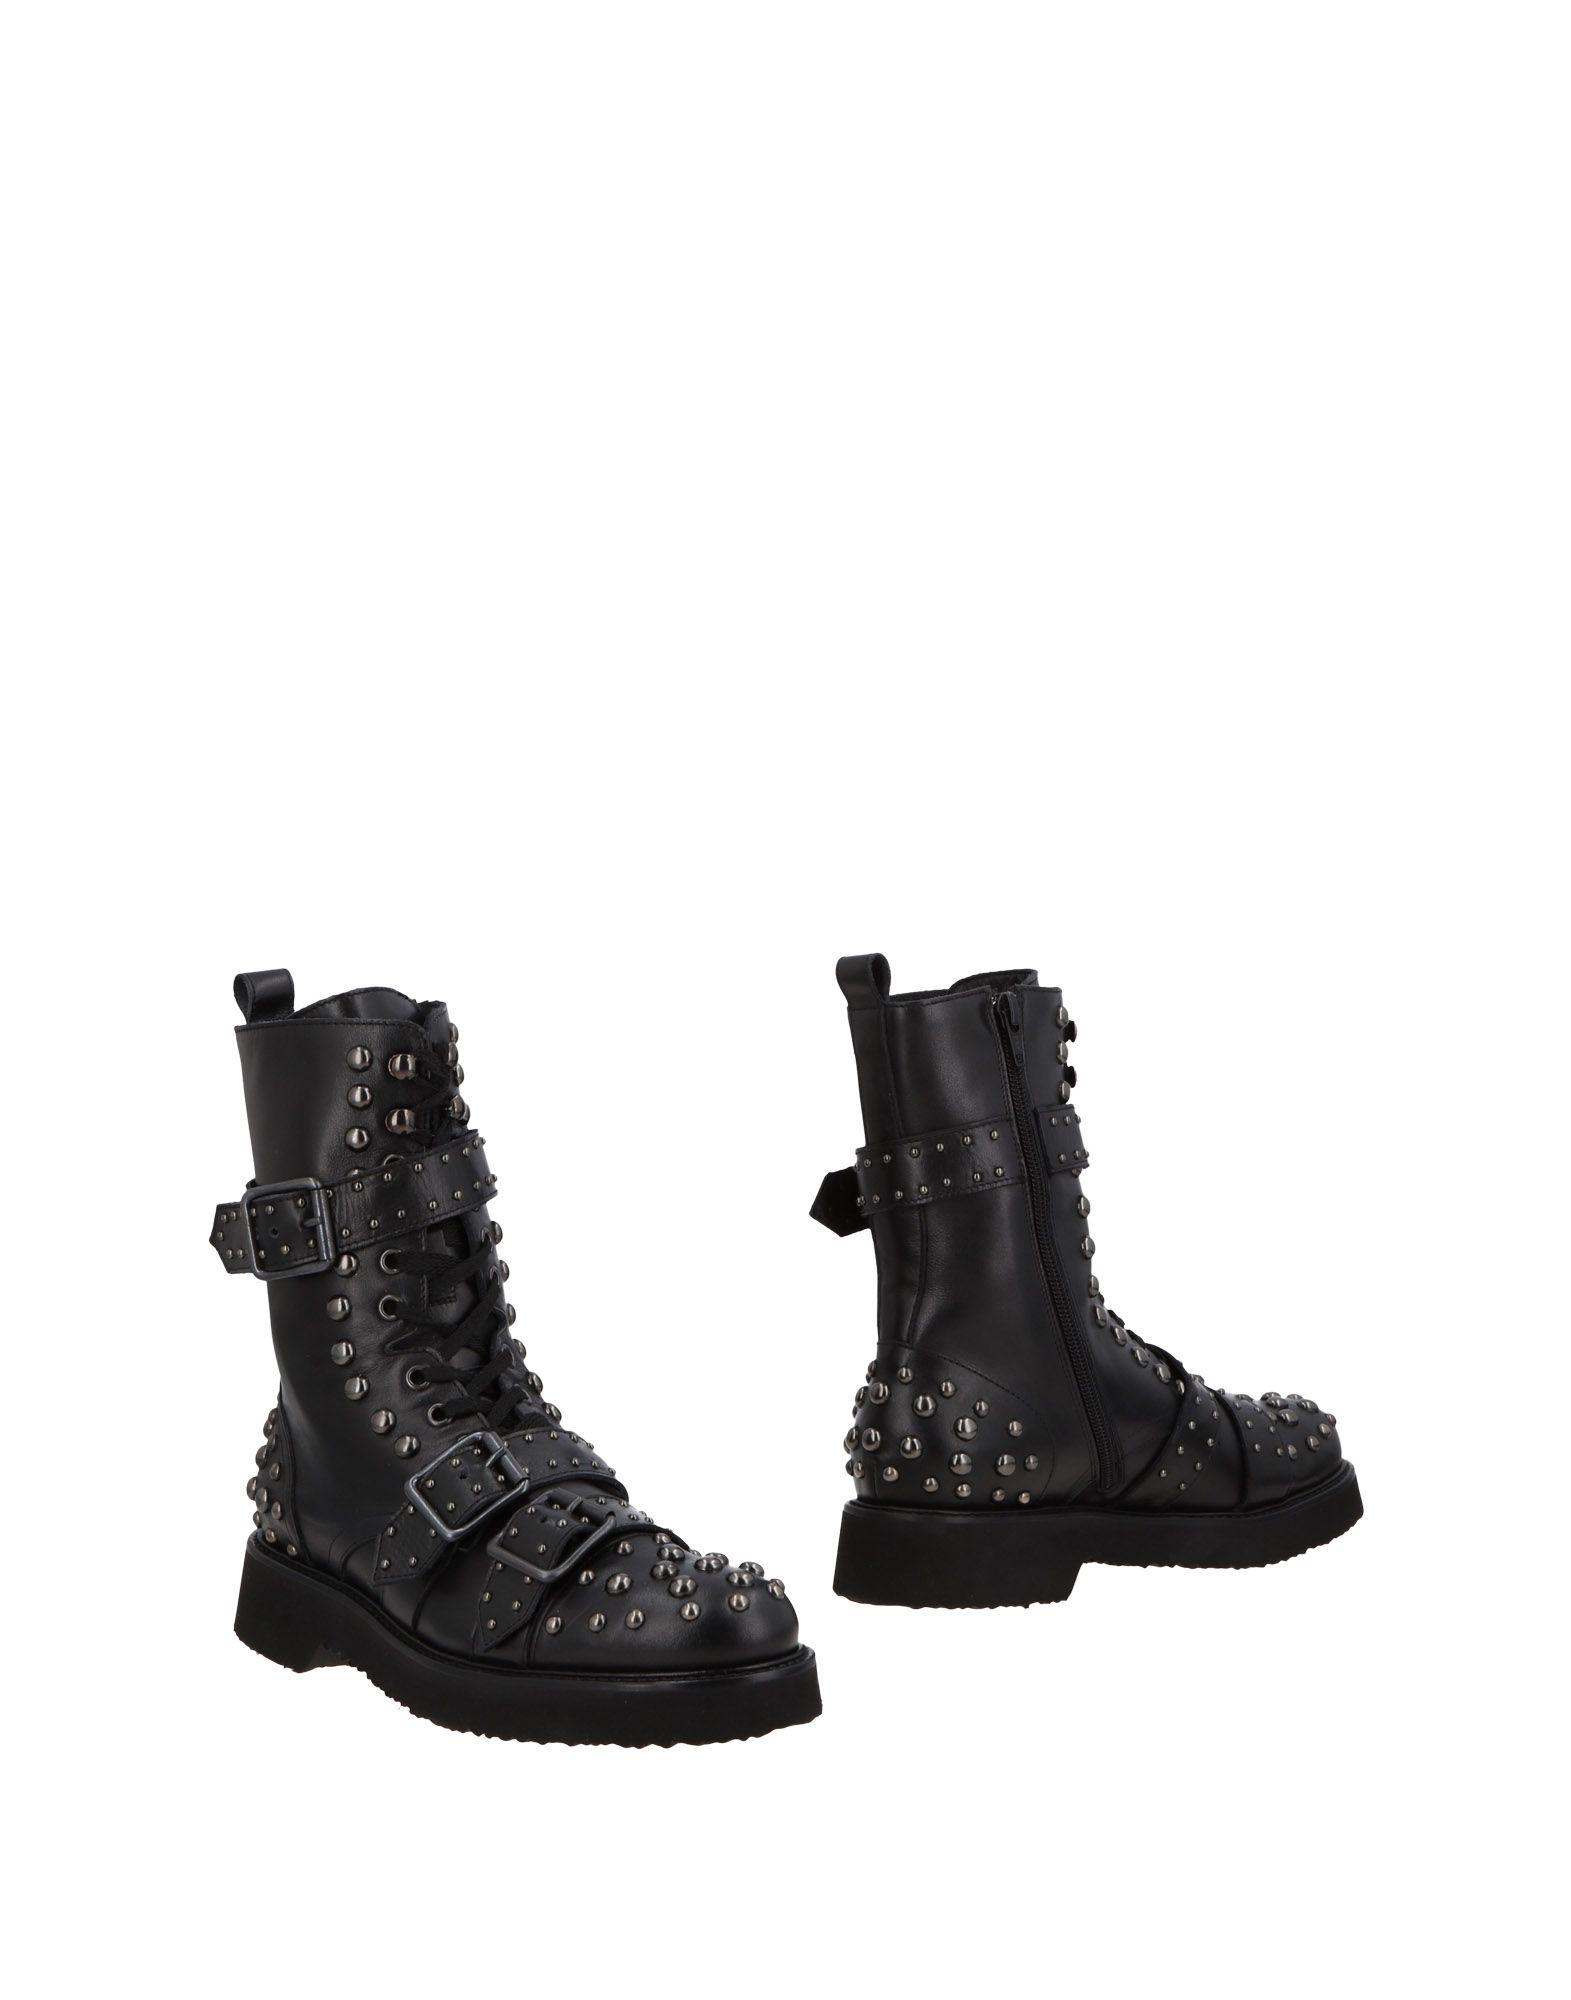 Stilvolle billige Schuhe By A. 11480524VG Stiefelette Damen  11480524VG A. 01d252